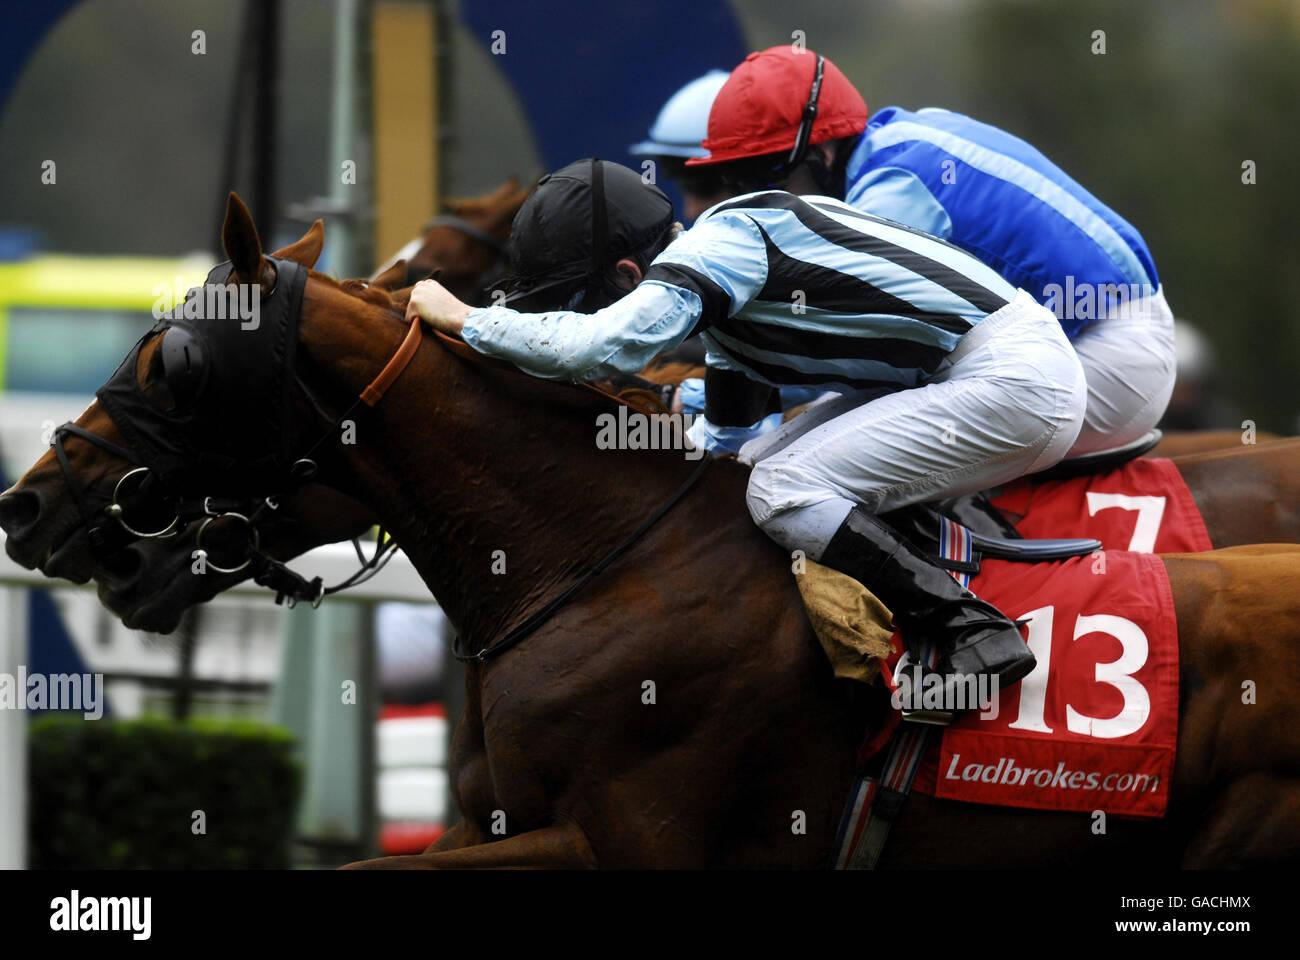 Horse Racing - Ascot Racecourse - Stock Image